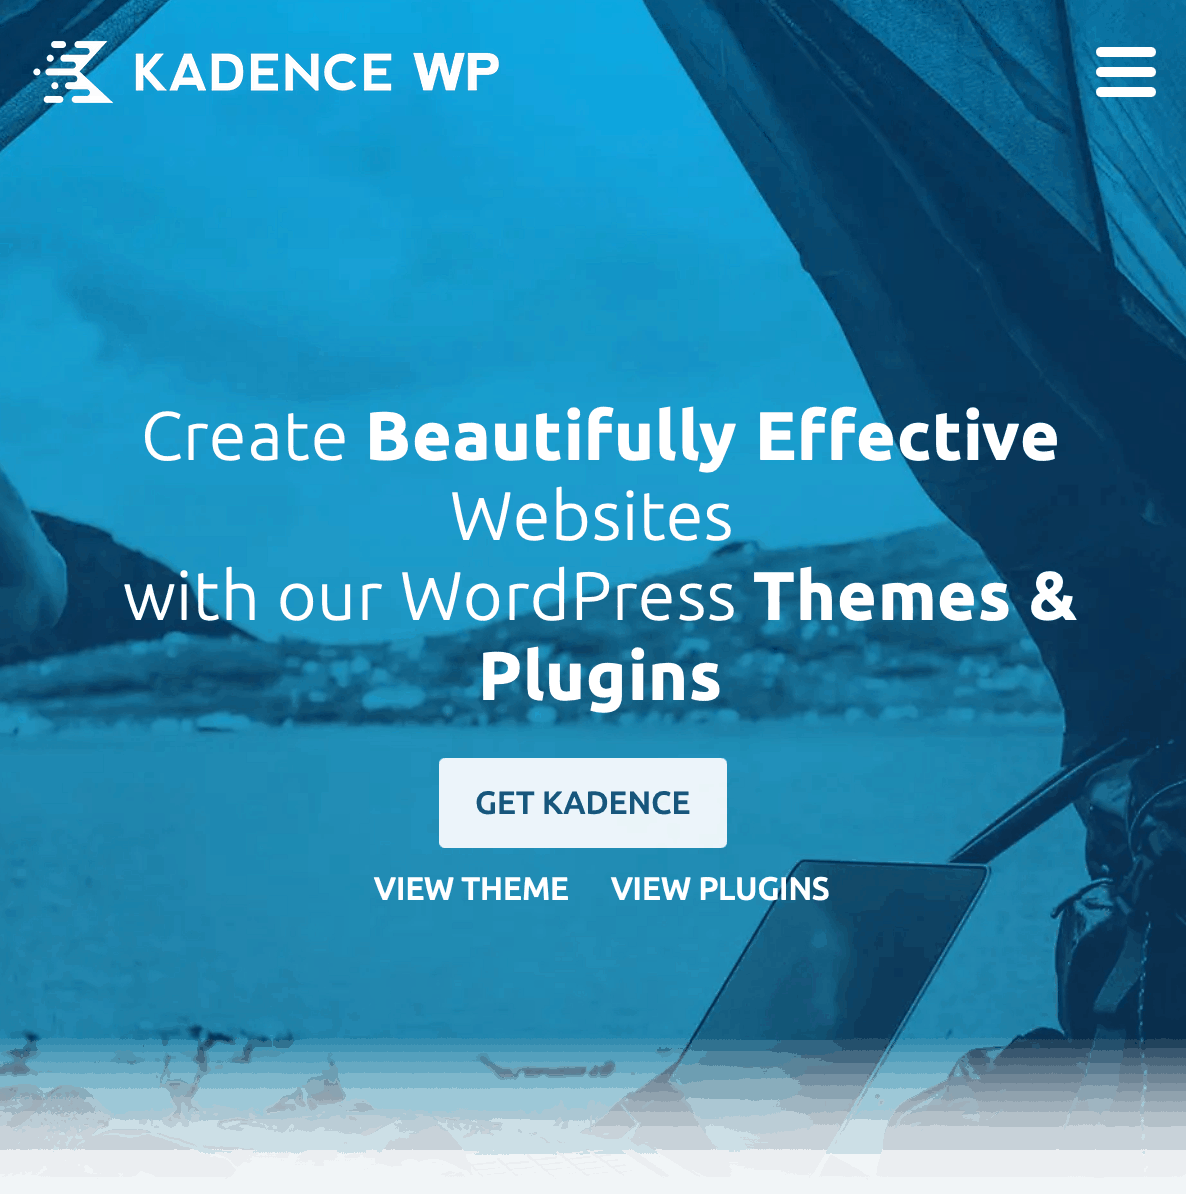 KadenceWP